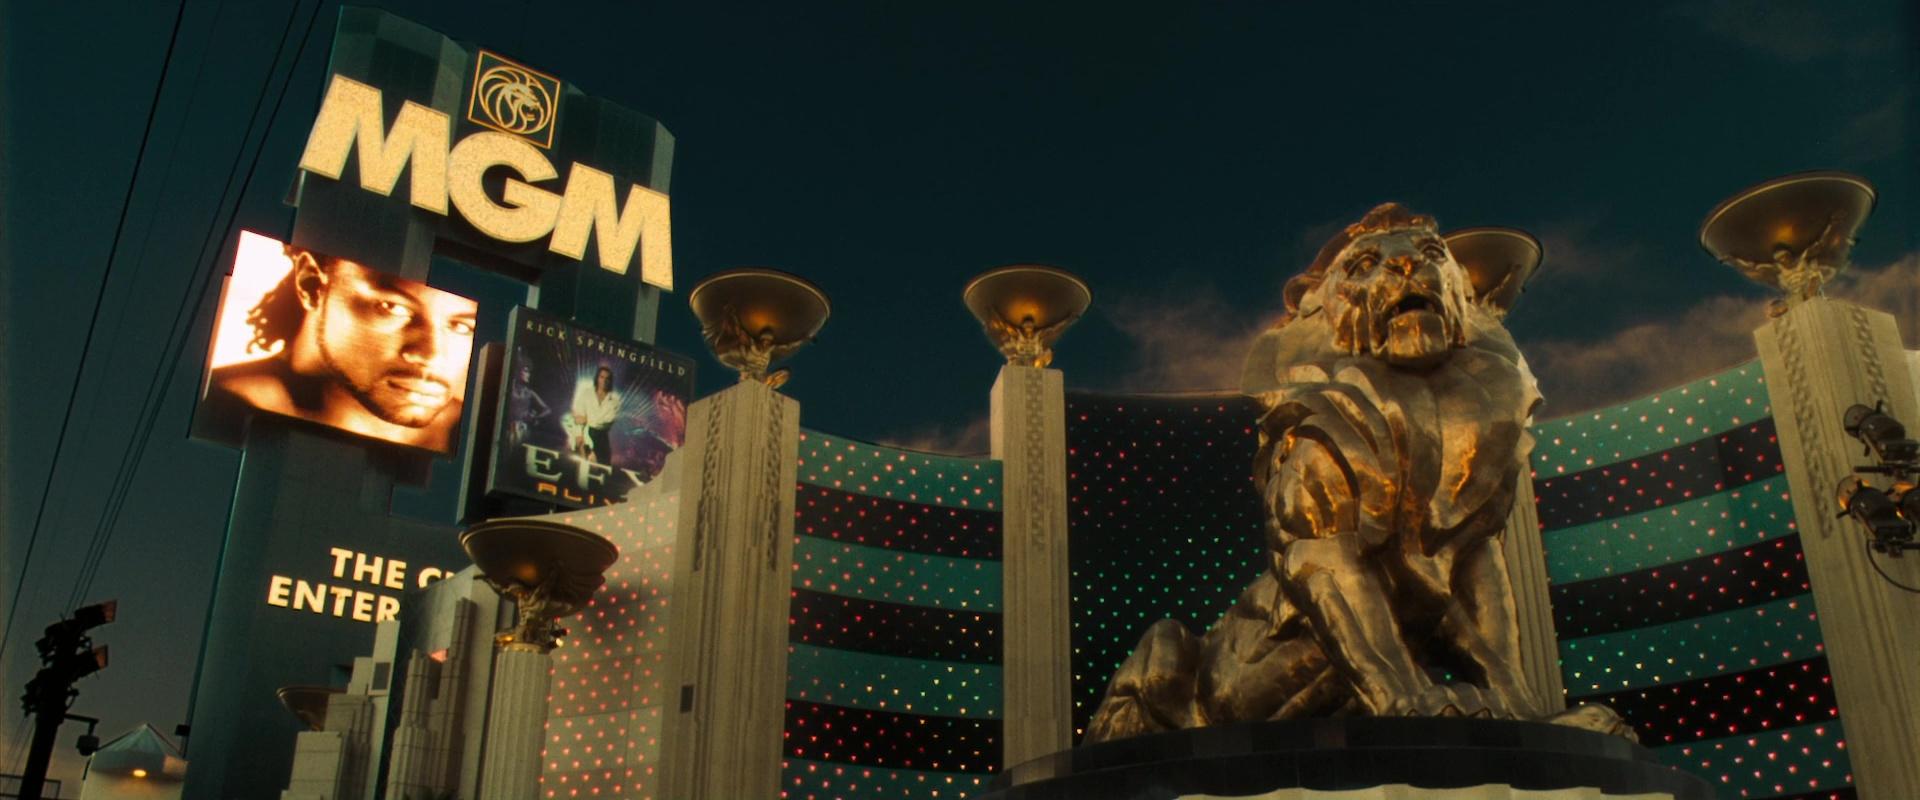 7 eleven casino in las vegas